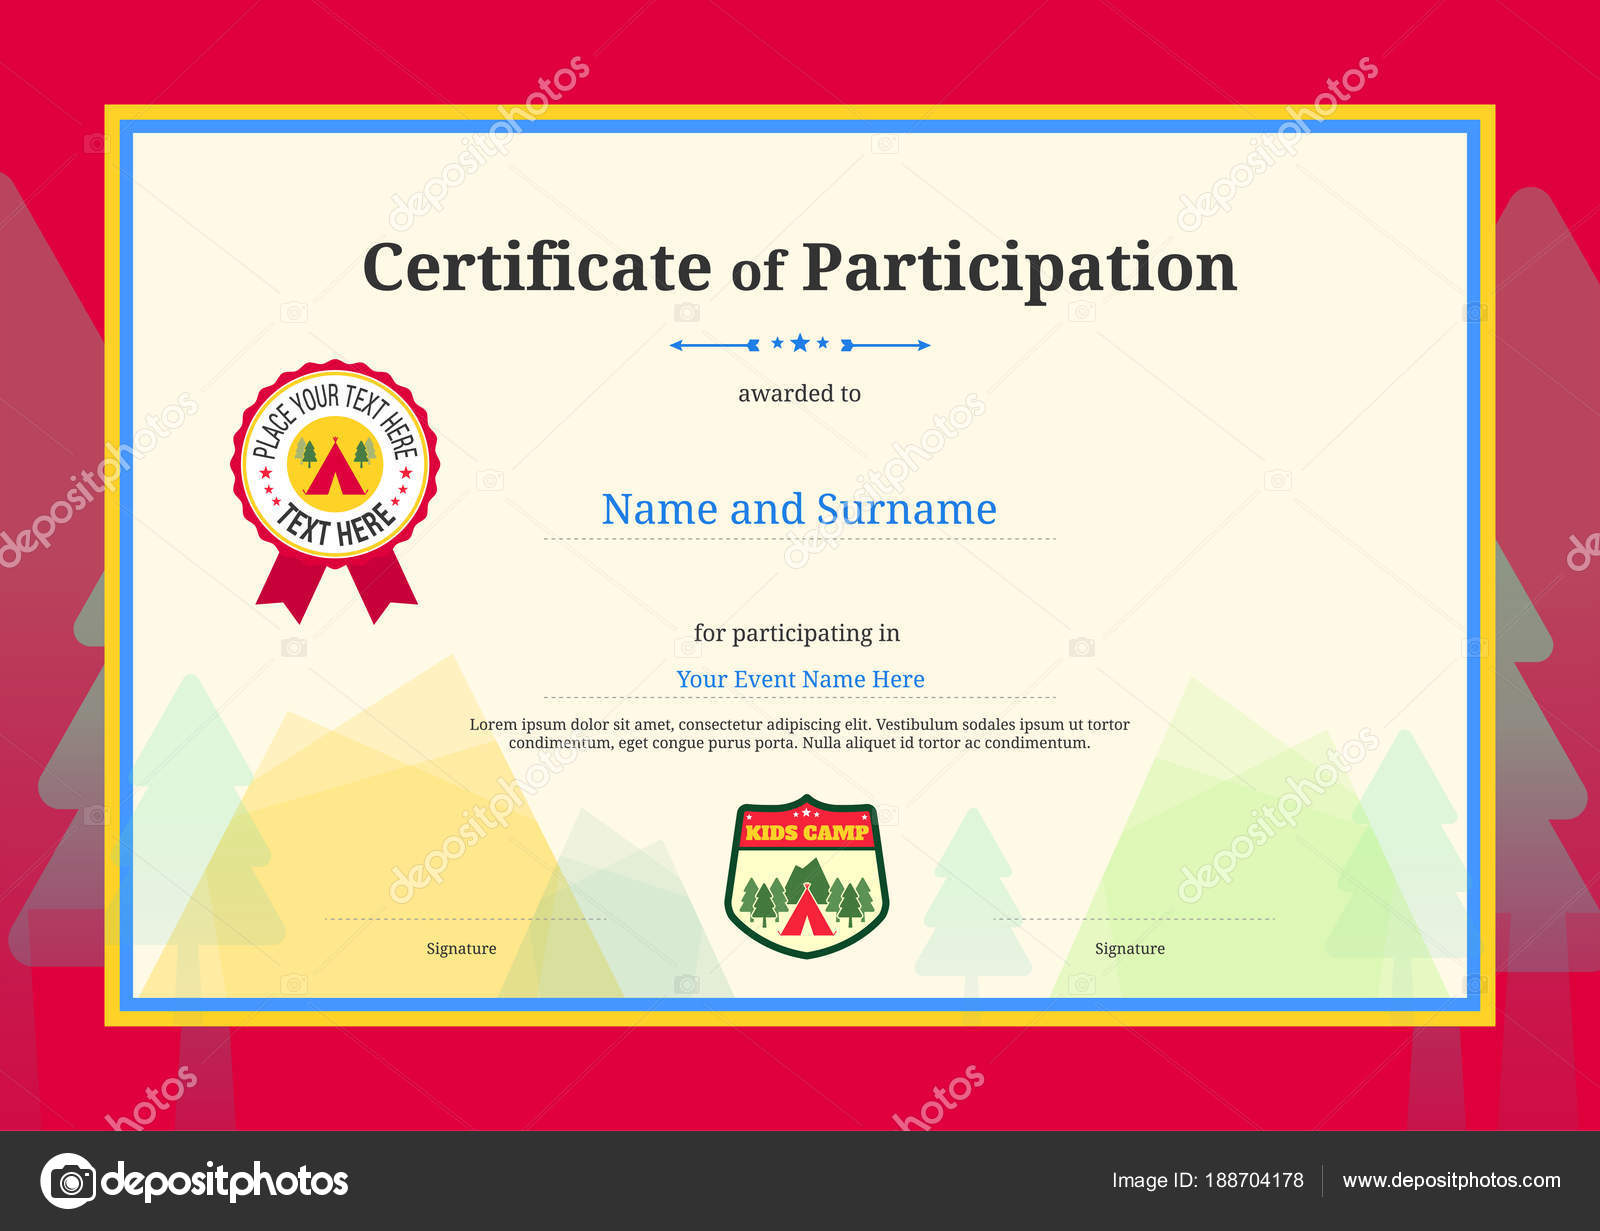 Kinder-Diplom oder Zertifikat Teilnahme Templates mit Farbe ...